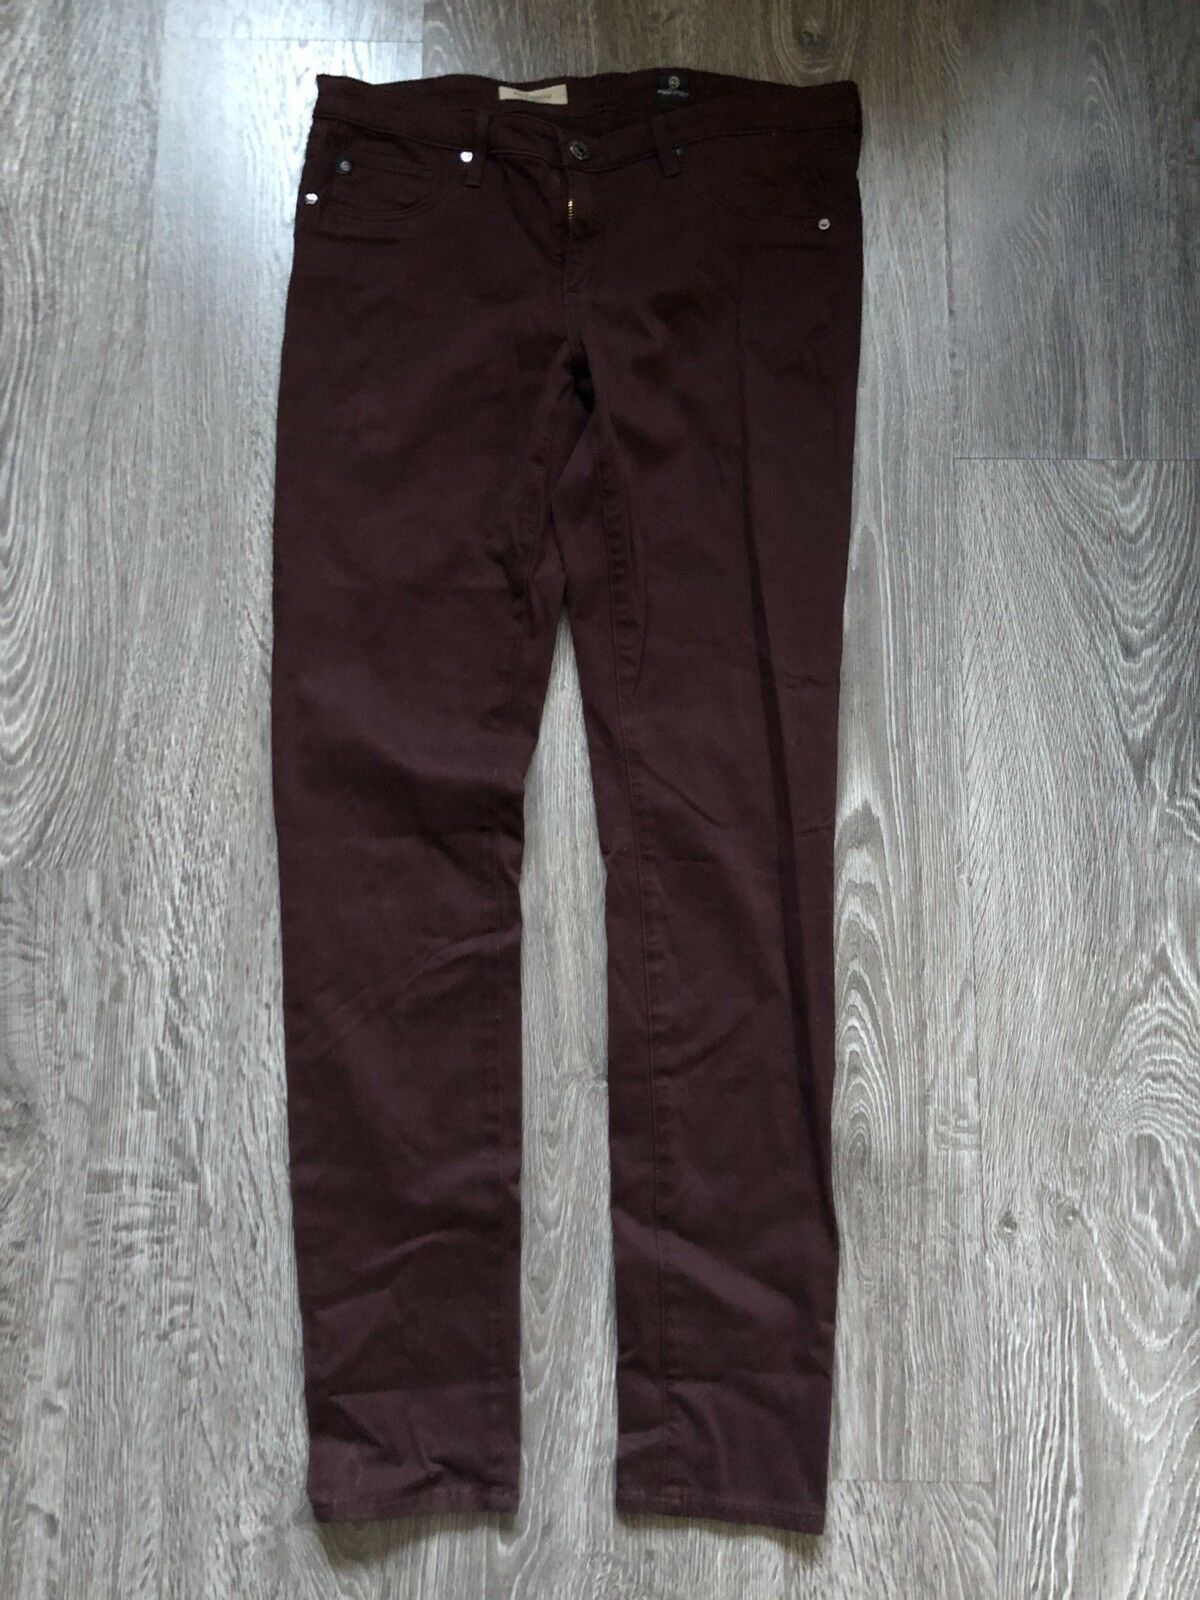 AG The Legging Skinny Jeans Burgundy Wine Maroon Red Size 30 R EUC